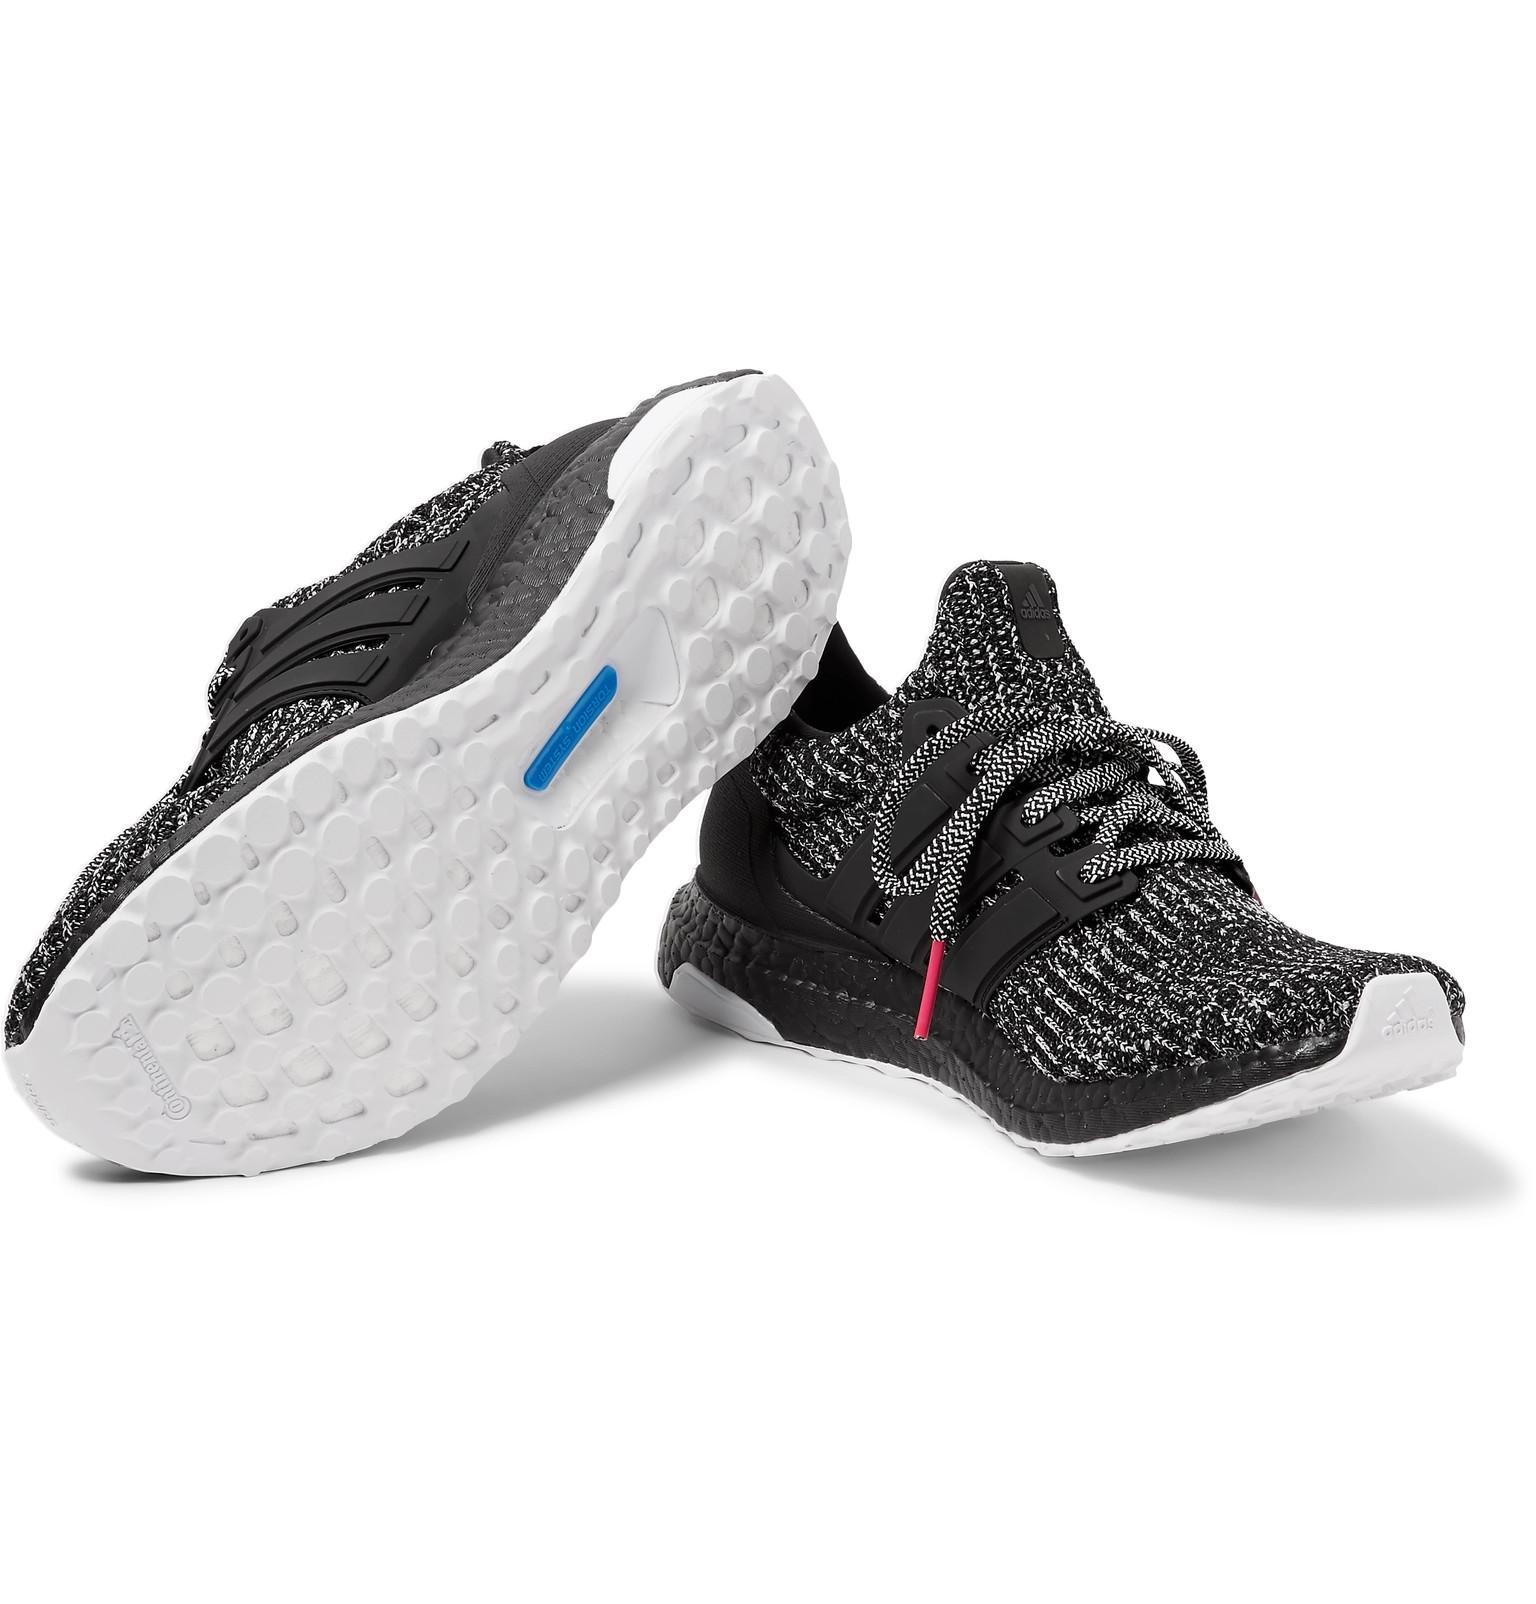 4d28bbc57f3 adidas Originals - UltraBOOST 4.0 Rubber-Trimmed Primeknit Sneakers